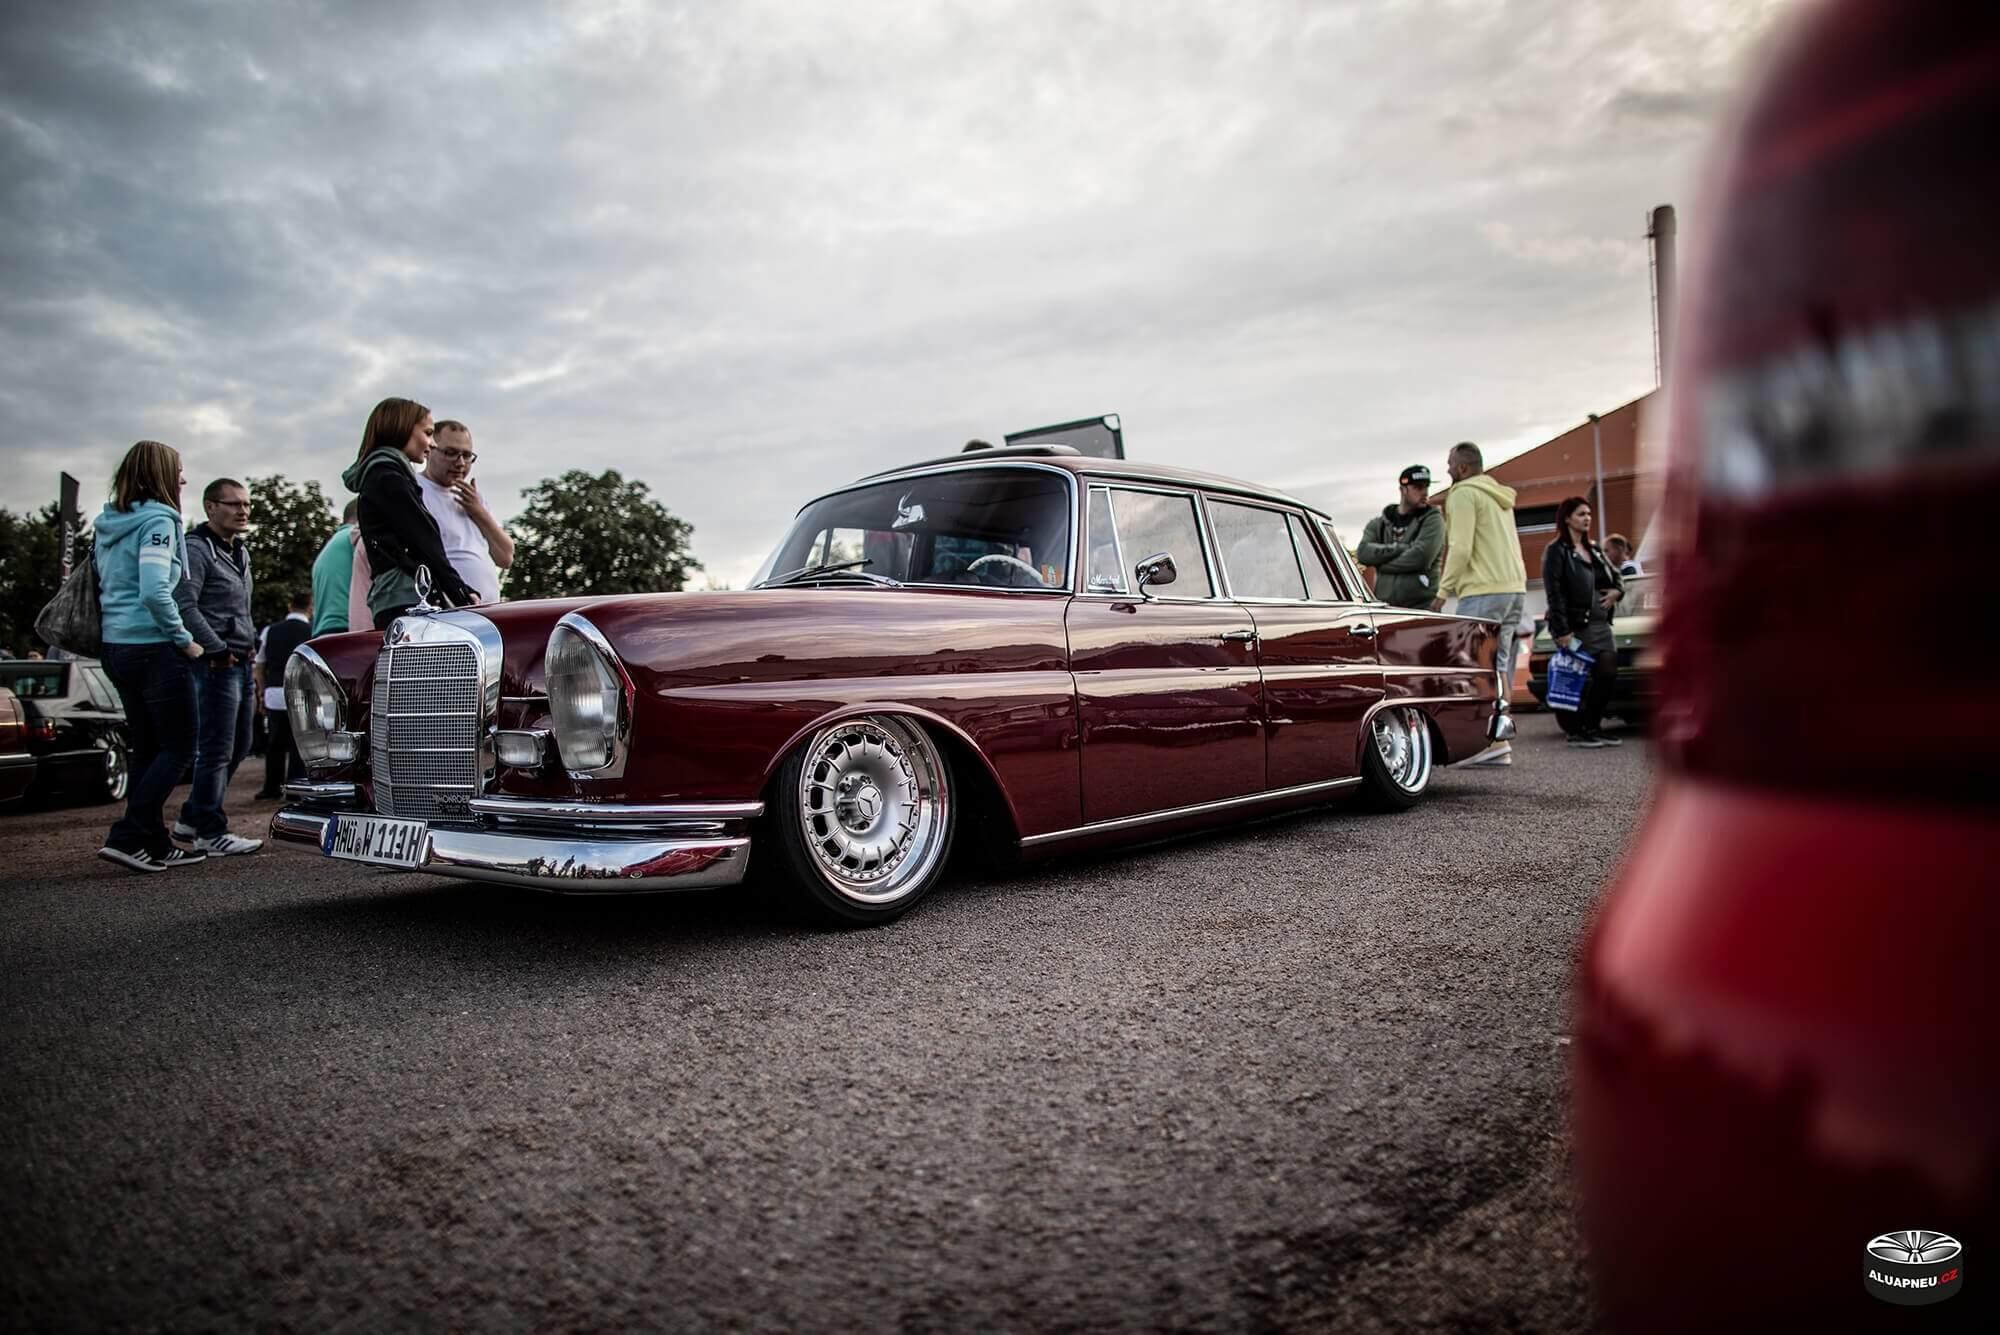 Alu kola Mercedes Benz 220 Sb - XS Classic Carnight 5.0 - Drážďany tuning sraz 2019 - www.aluapneu.cz